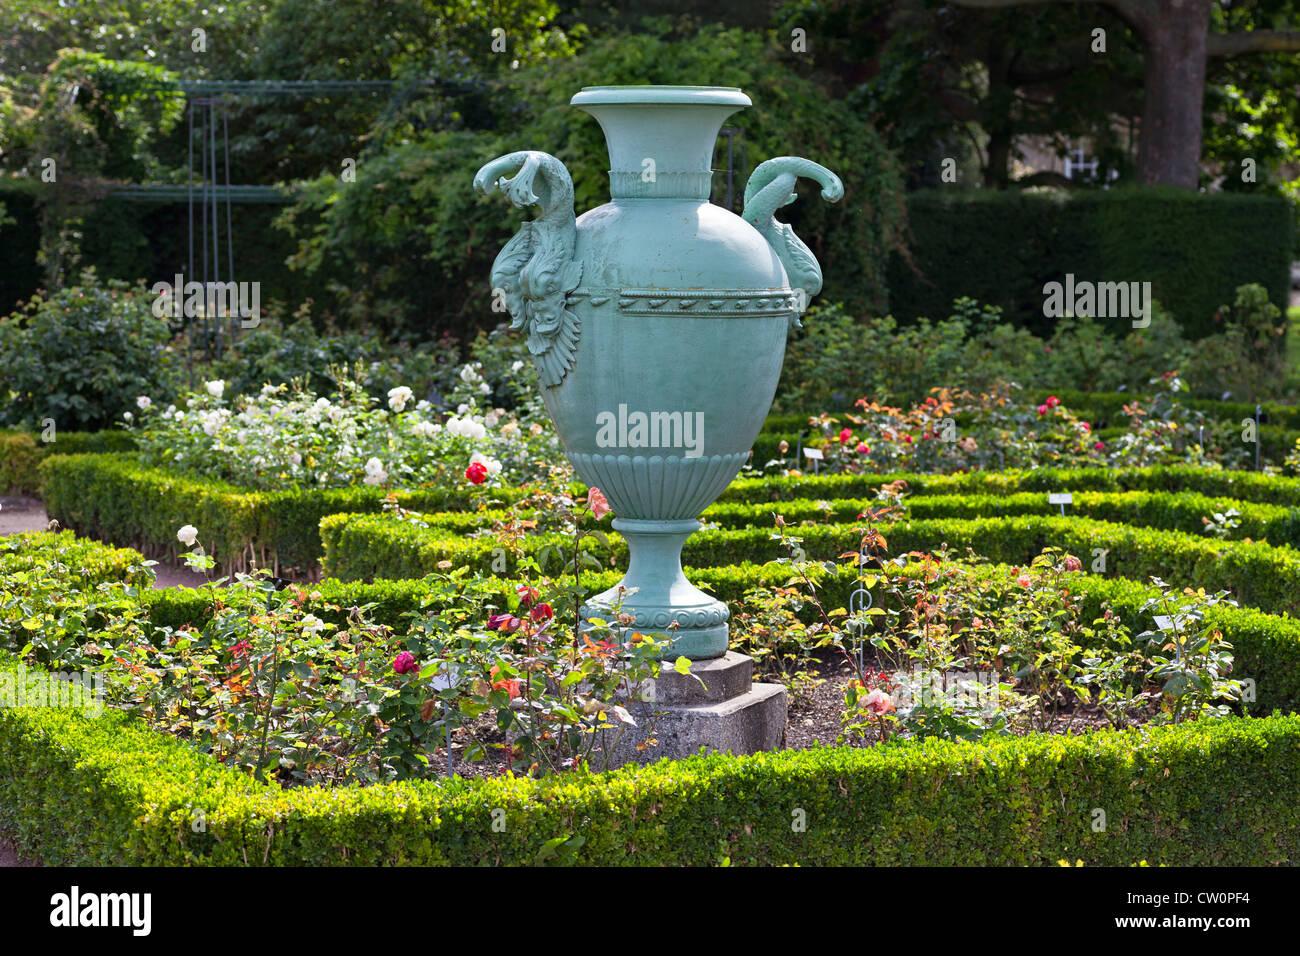 Decorative Garden Urns Stock Photos & Decorative Garden Urns Stock ...